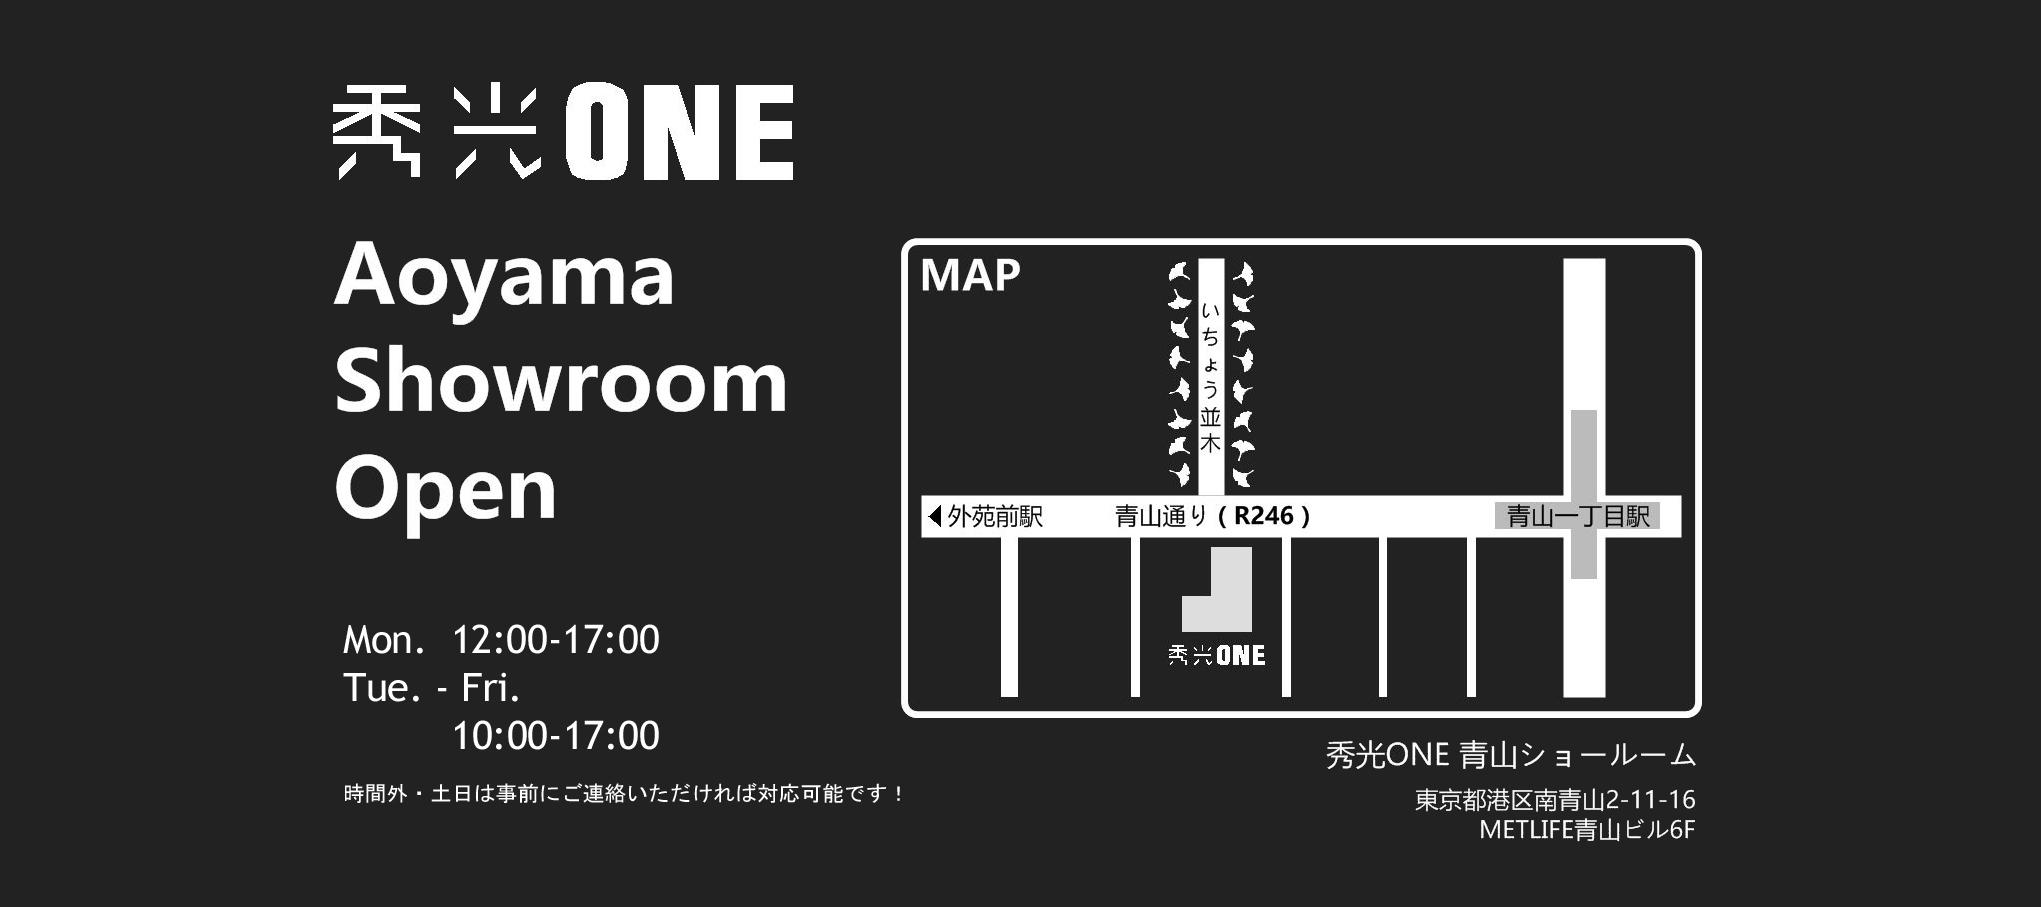 MAP Shukoh ONE aoyama